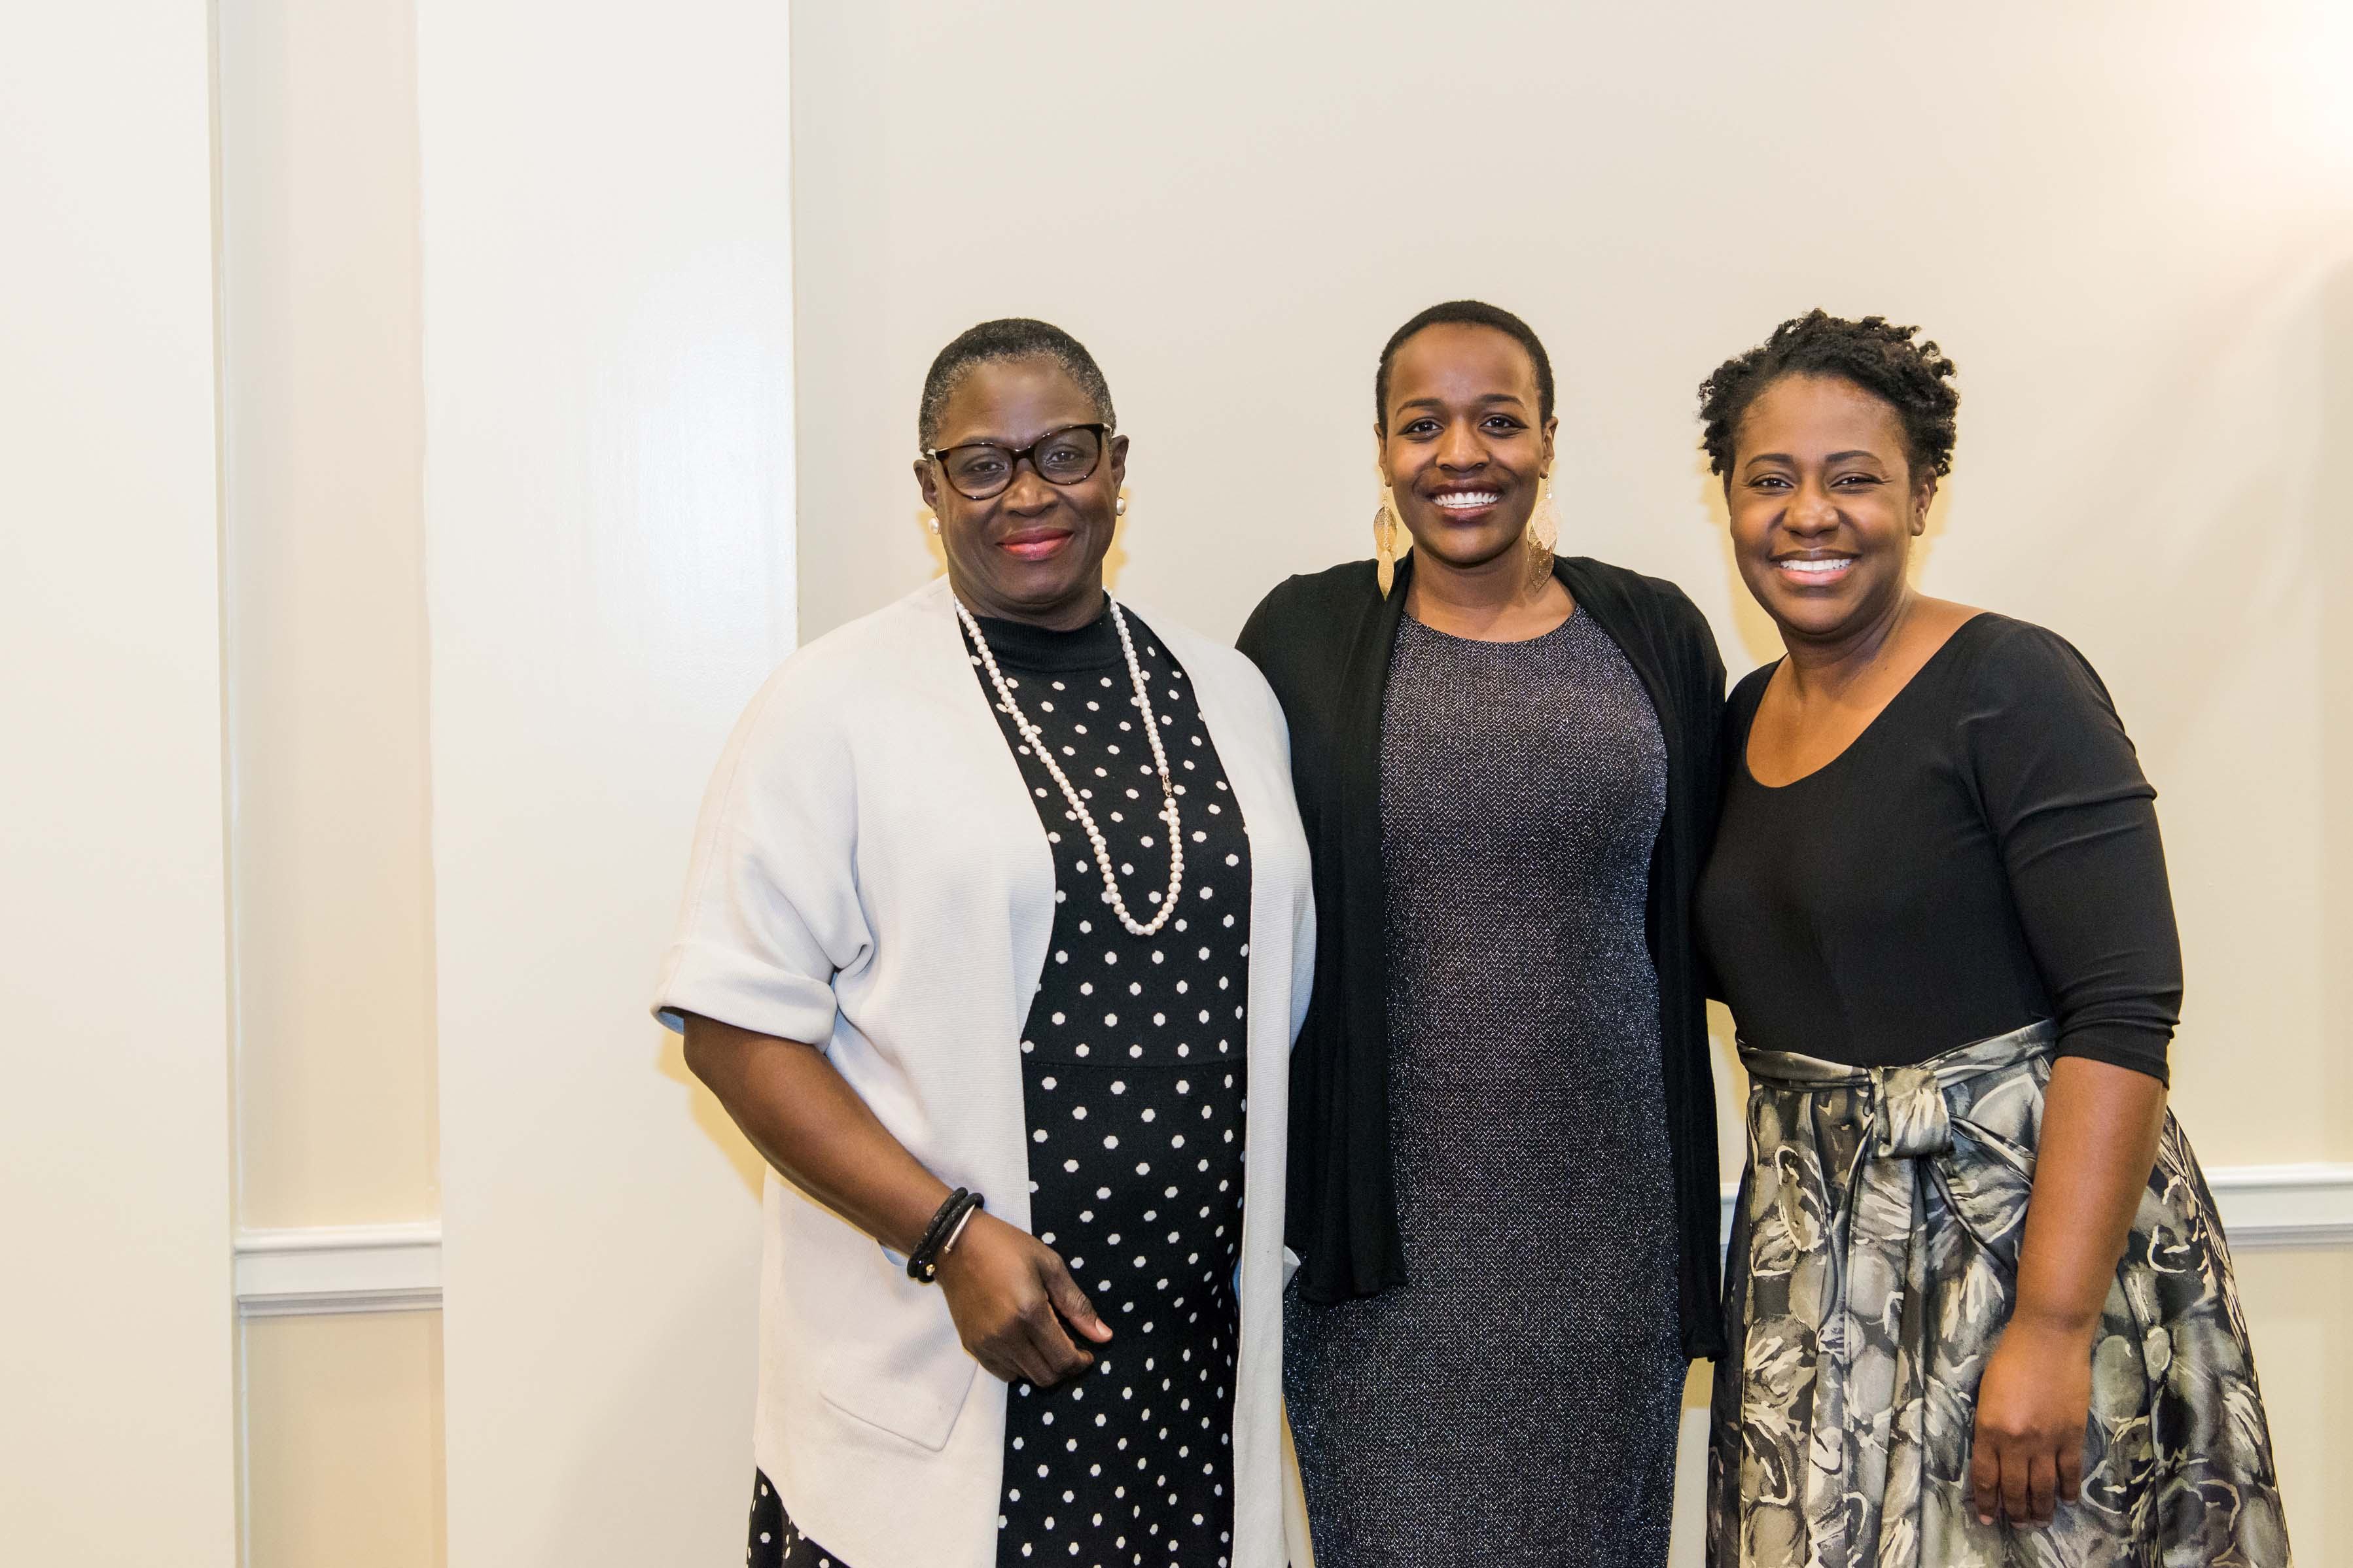 Naomi Mburu poses with two others at Annapolis Alumni reception